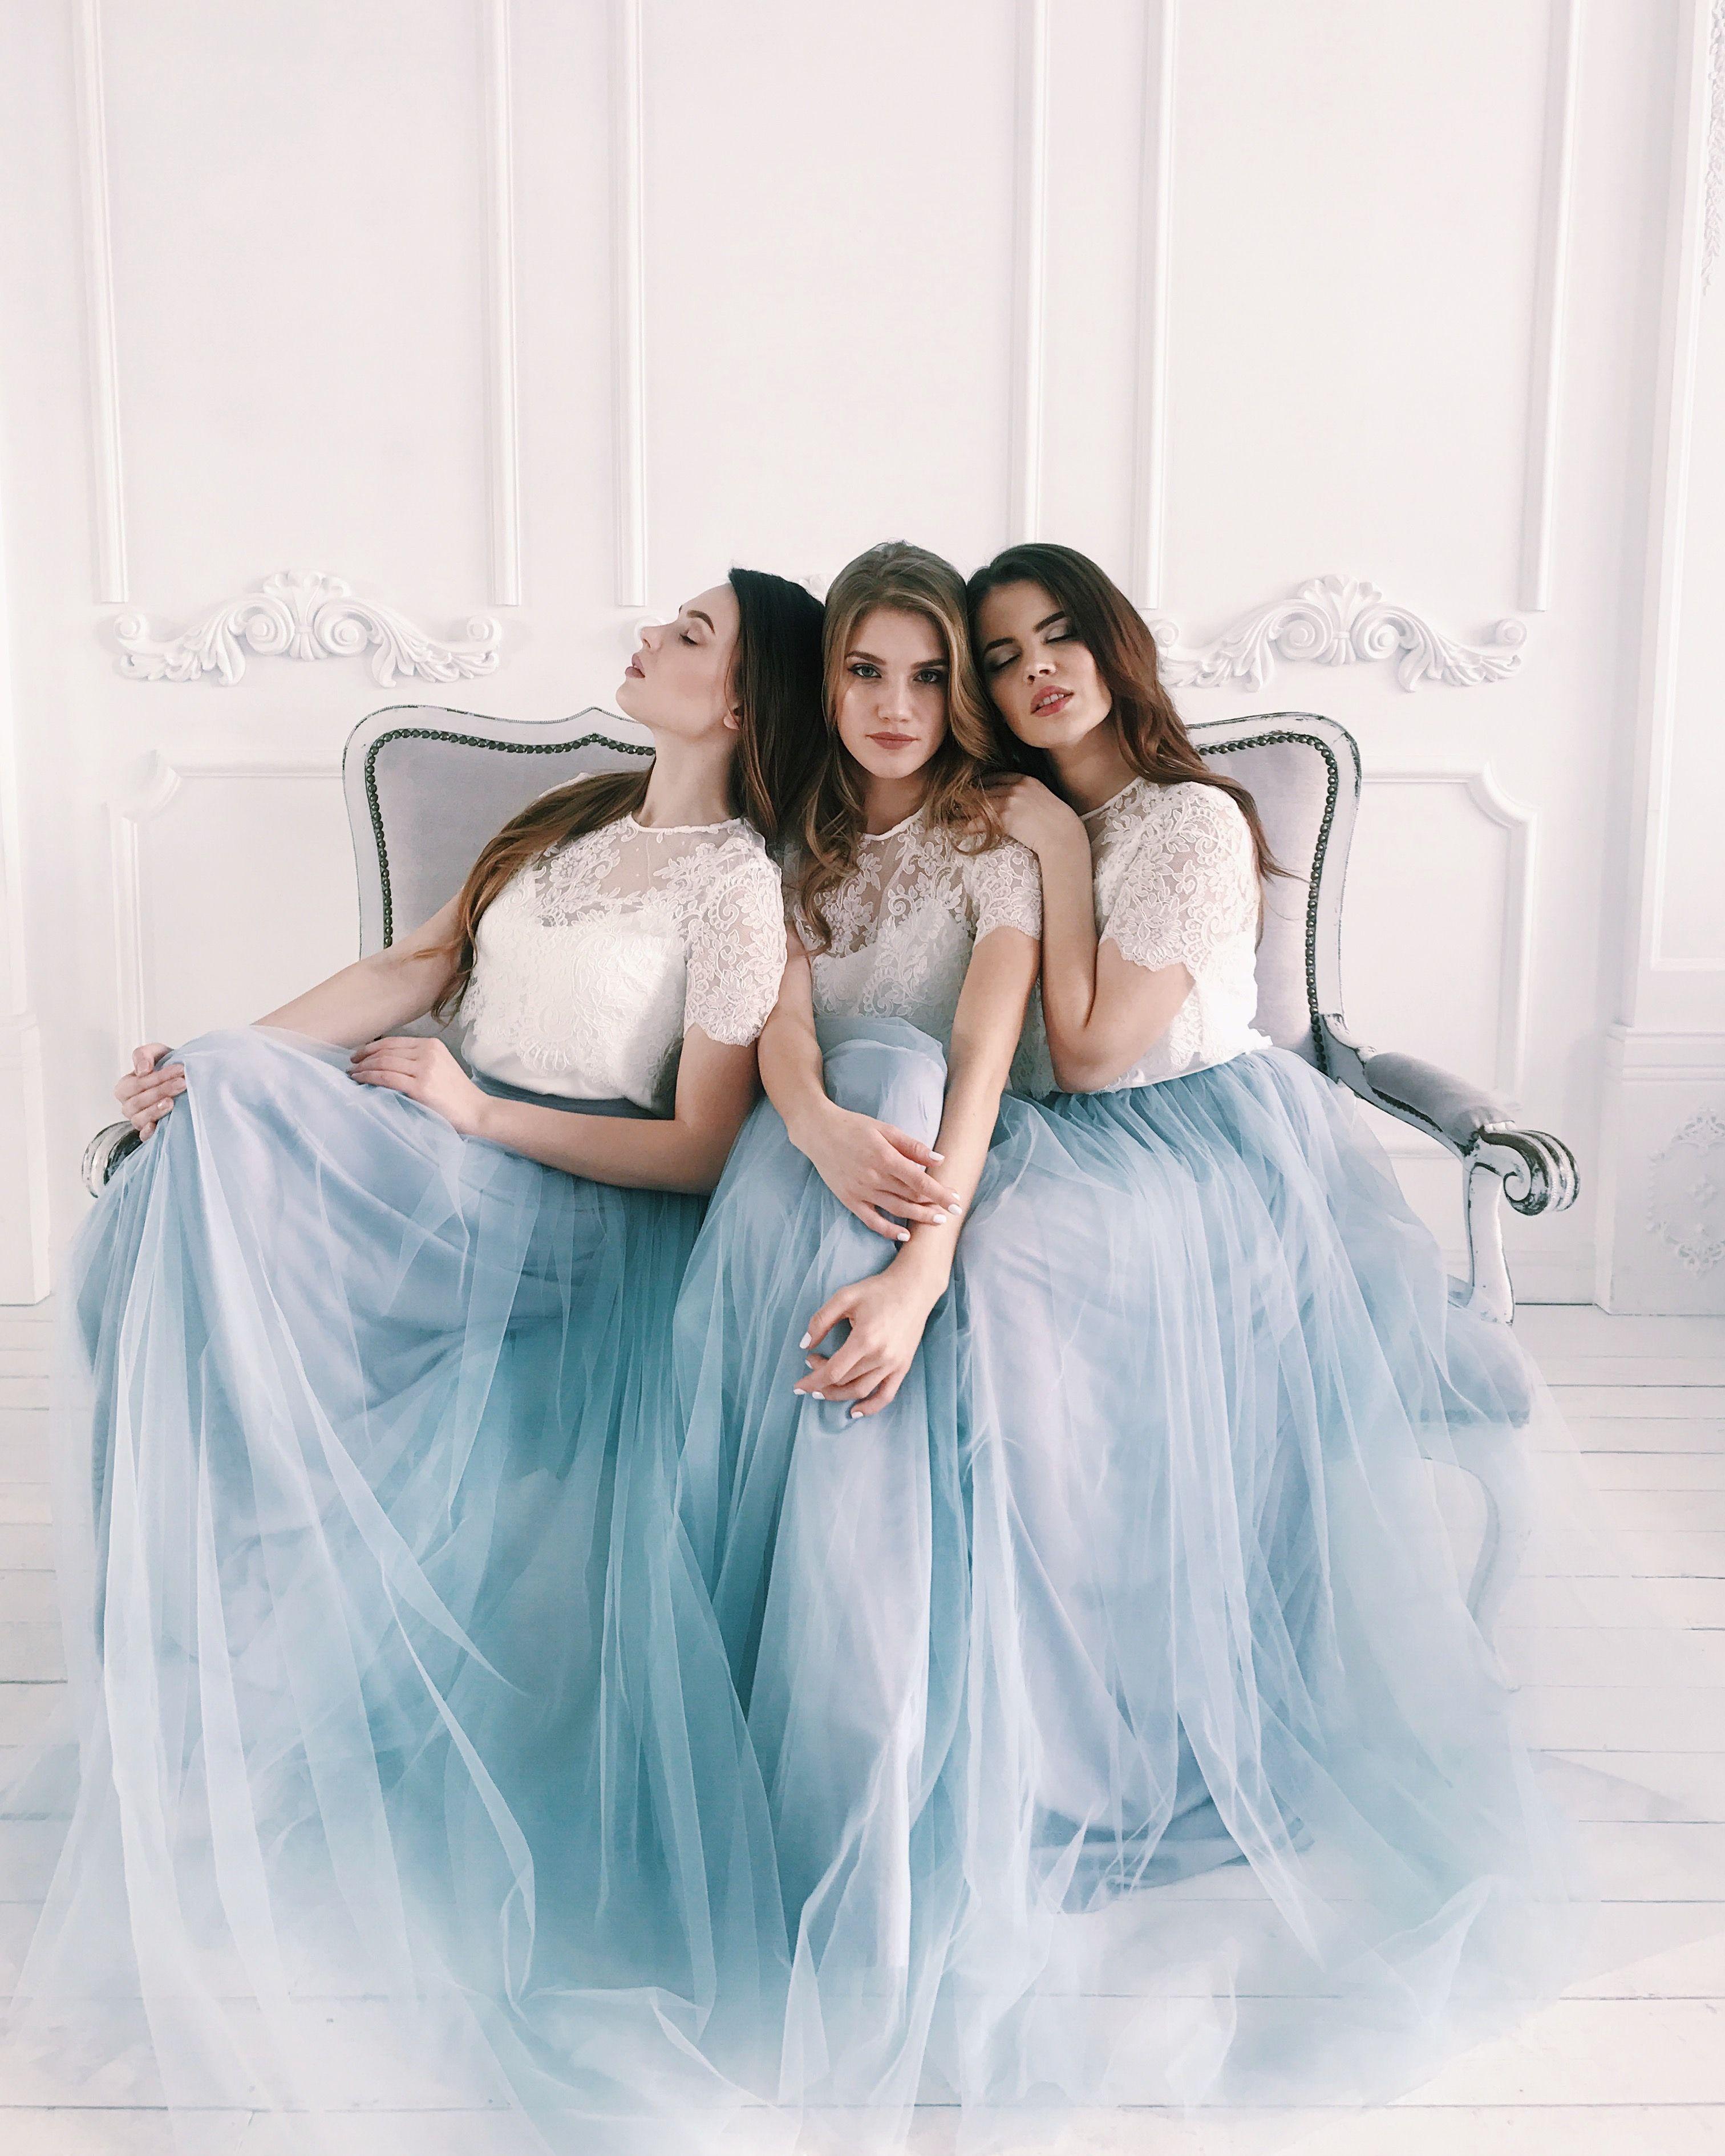 Boho Tulle Wedding Dress Bridesmaid Dresses Bridal Two Etsy Two Piece Bridesmaid Dresses Tulle Bridesmaid Dress Tulle Bridesmaid Dress Long